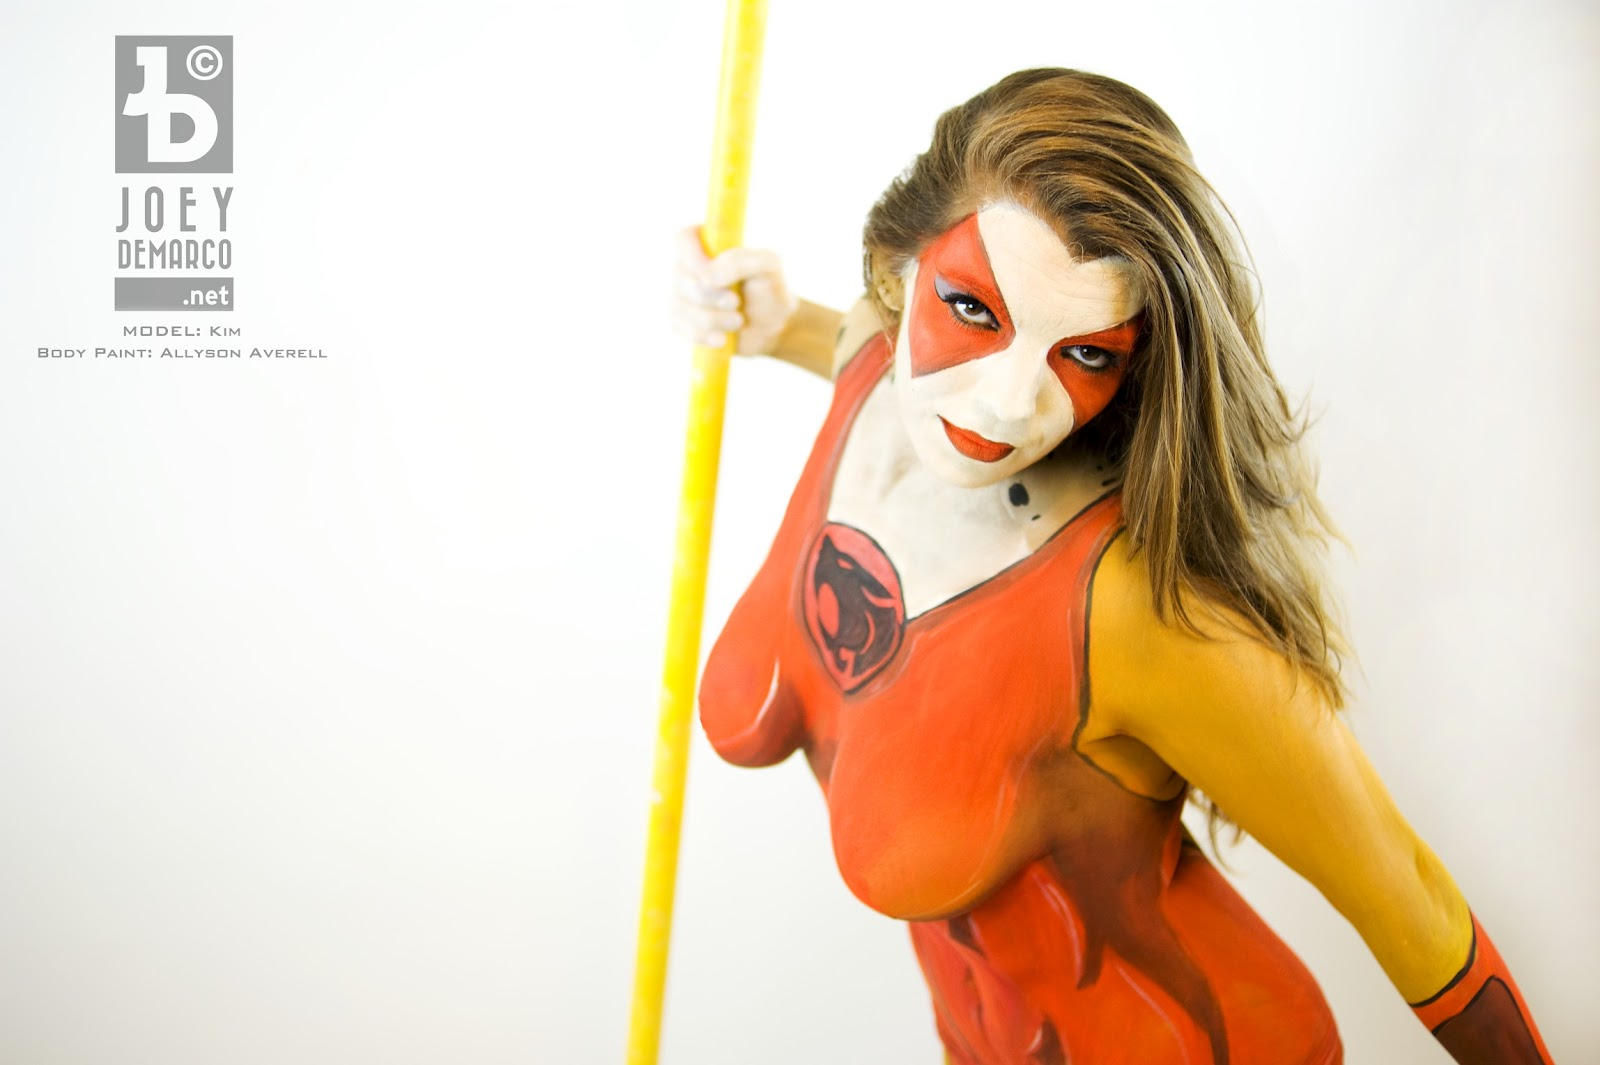 Photography by Joey DeMarco: Cheetara Body Paint